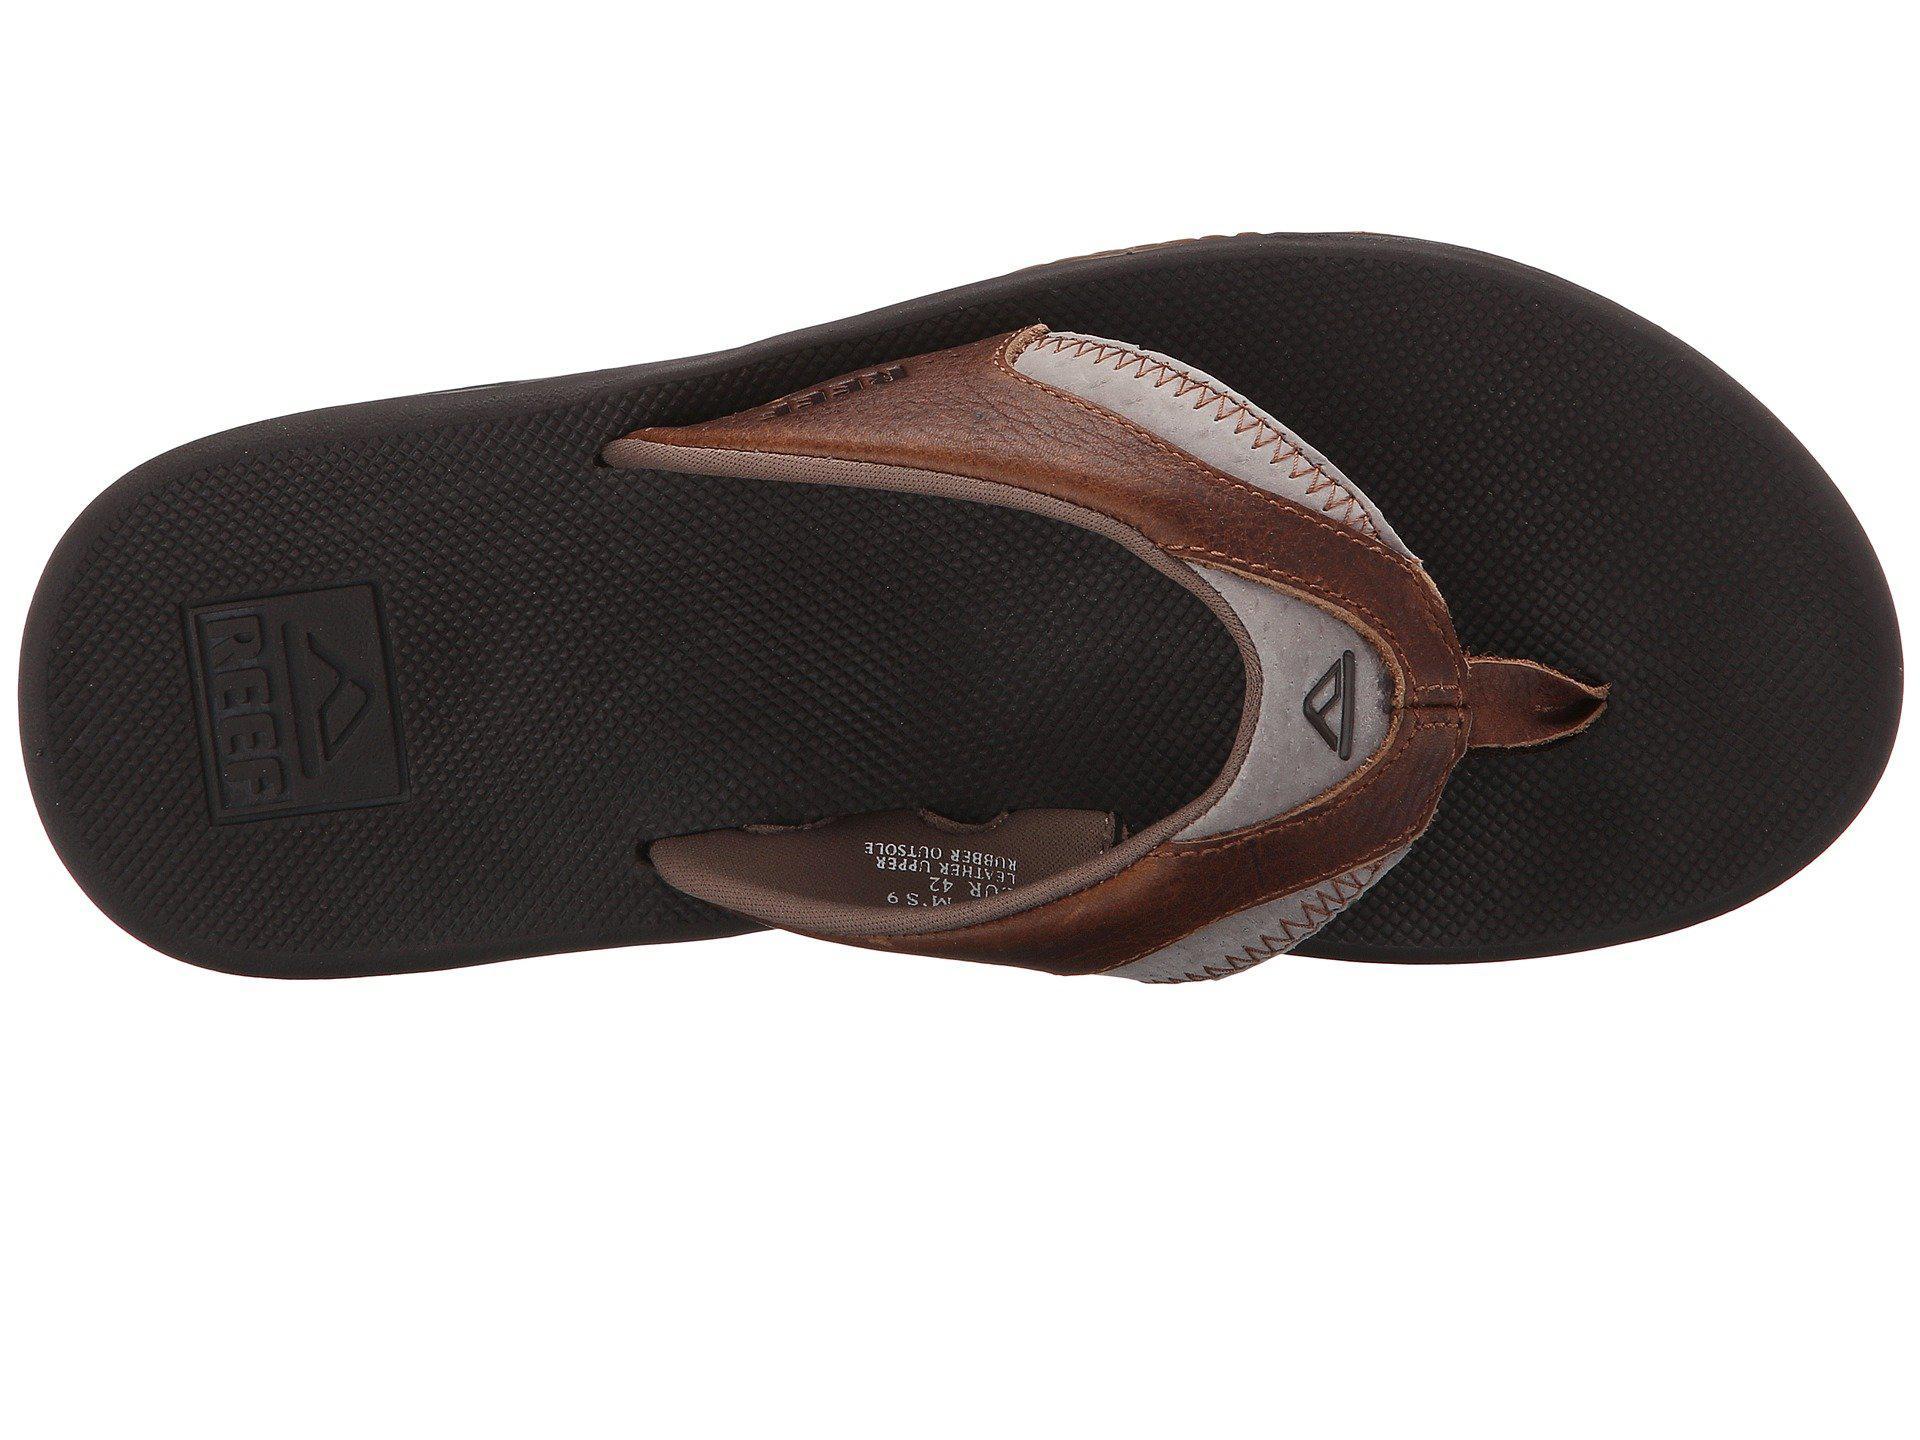 2190542674c7 Reef - Brown Fanning Leather (bronze) Men s Sandals for Men - Lyst. View  fullscreen